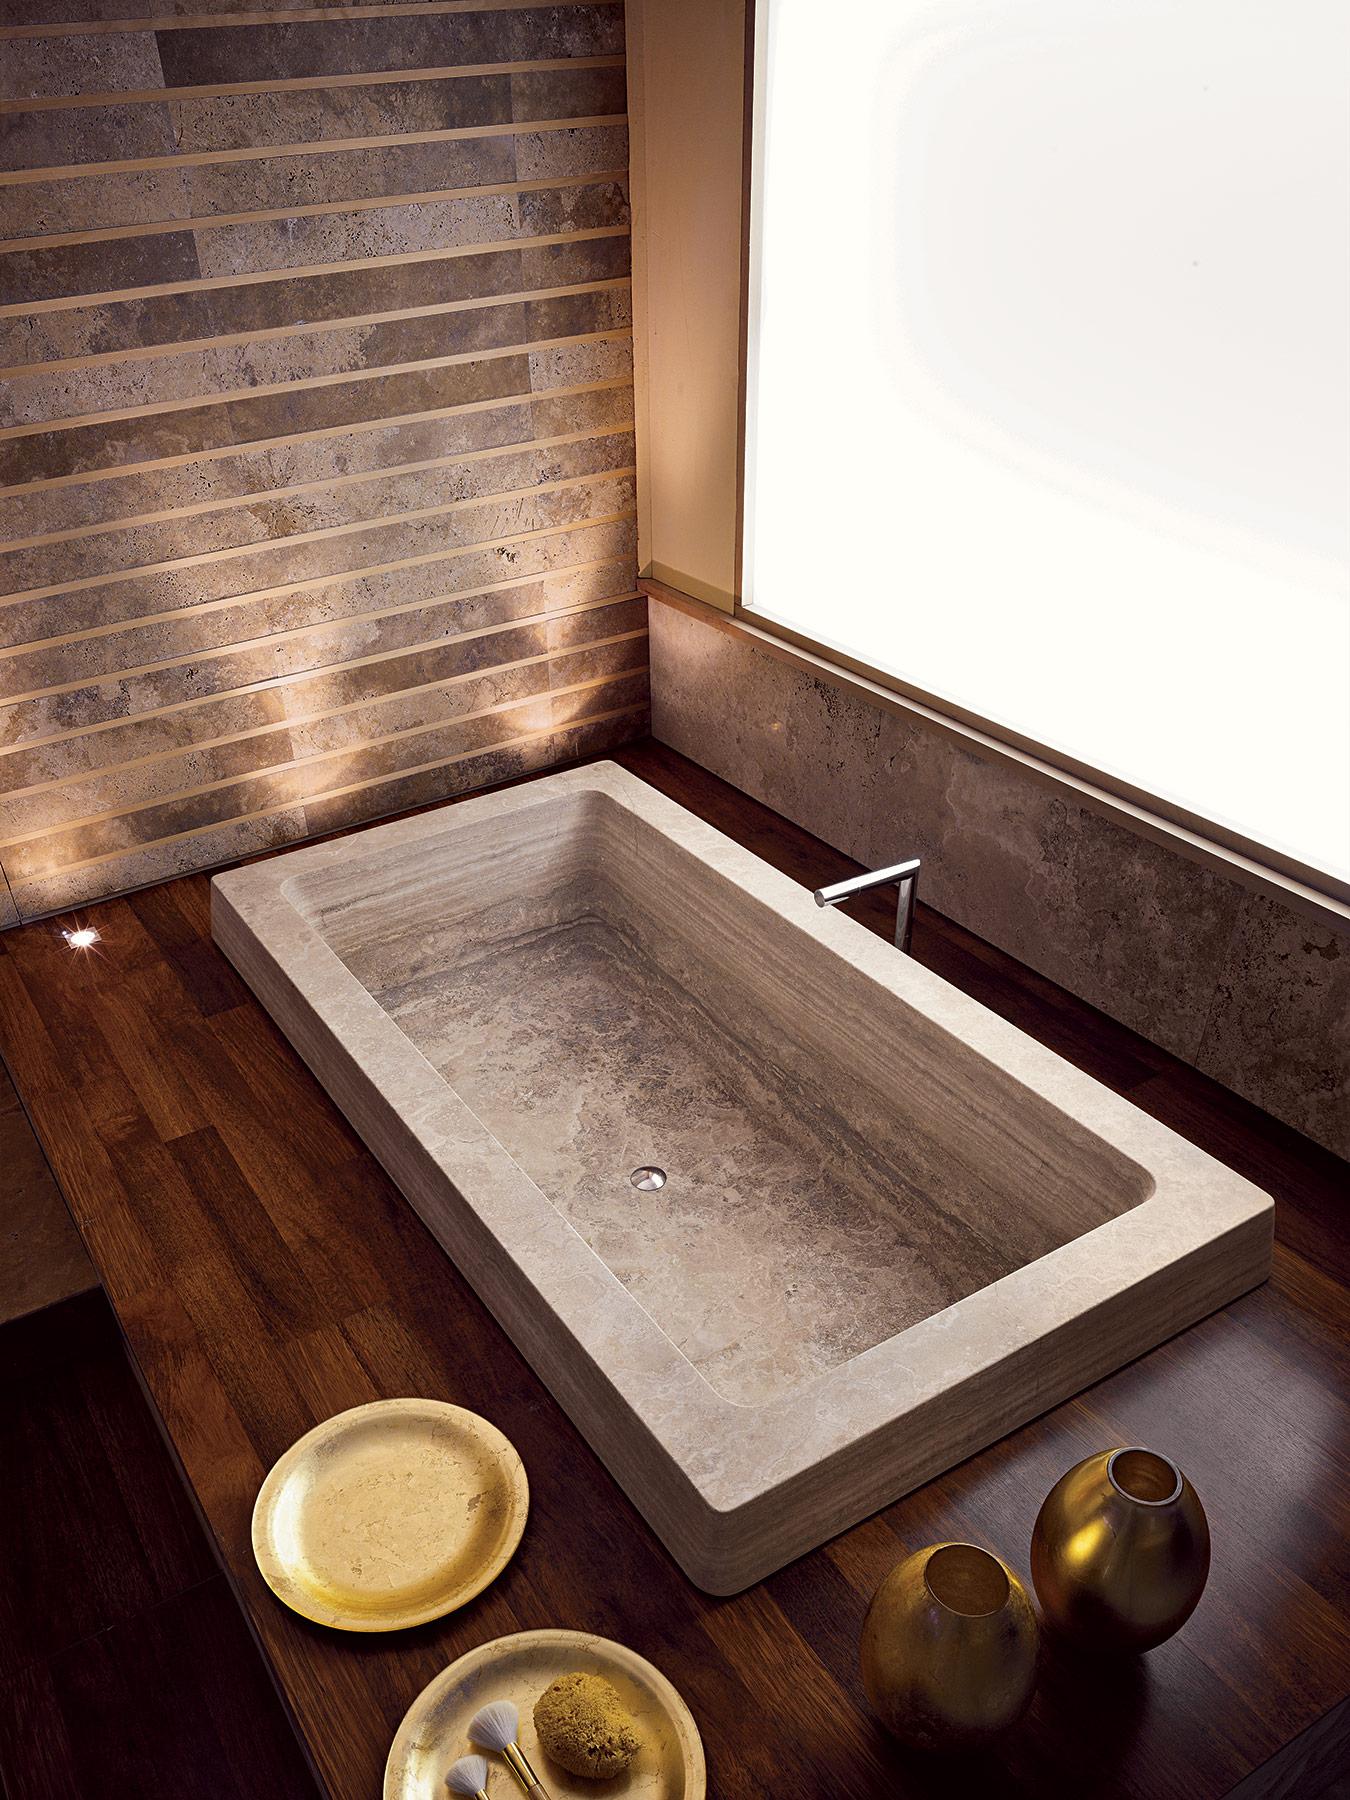 Modern Glove Built-In Bathtub